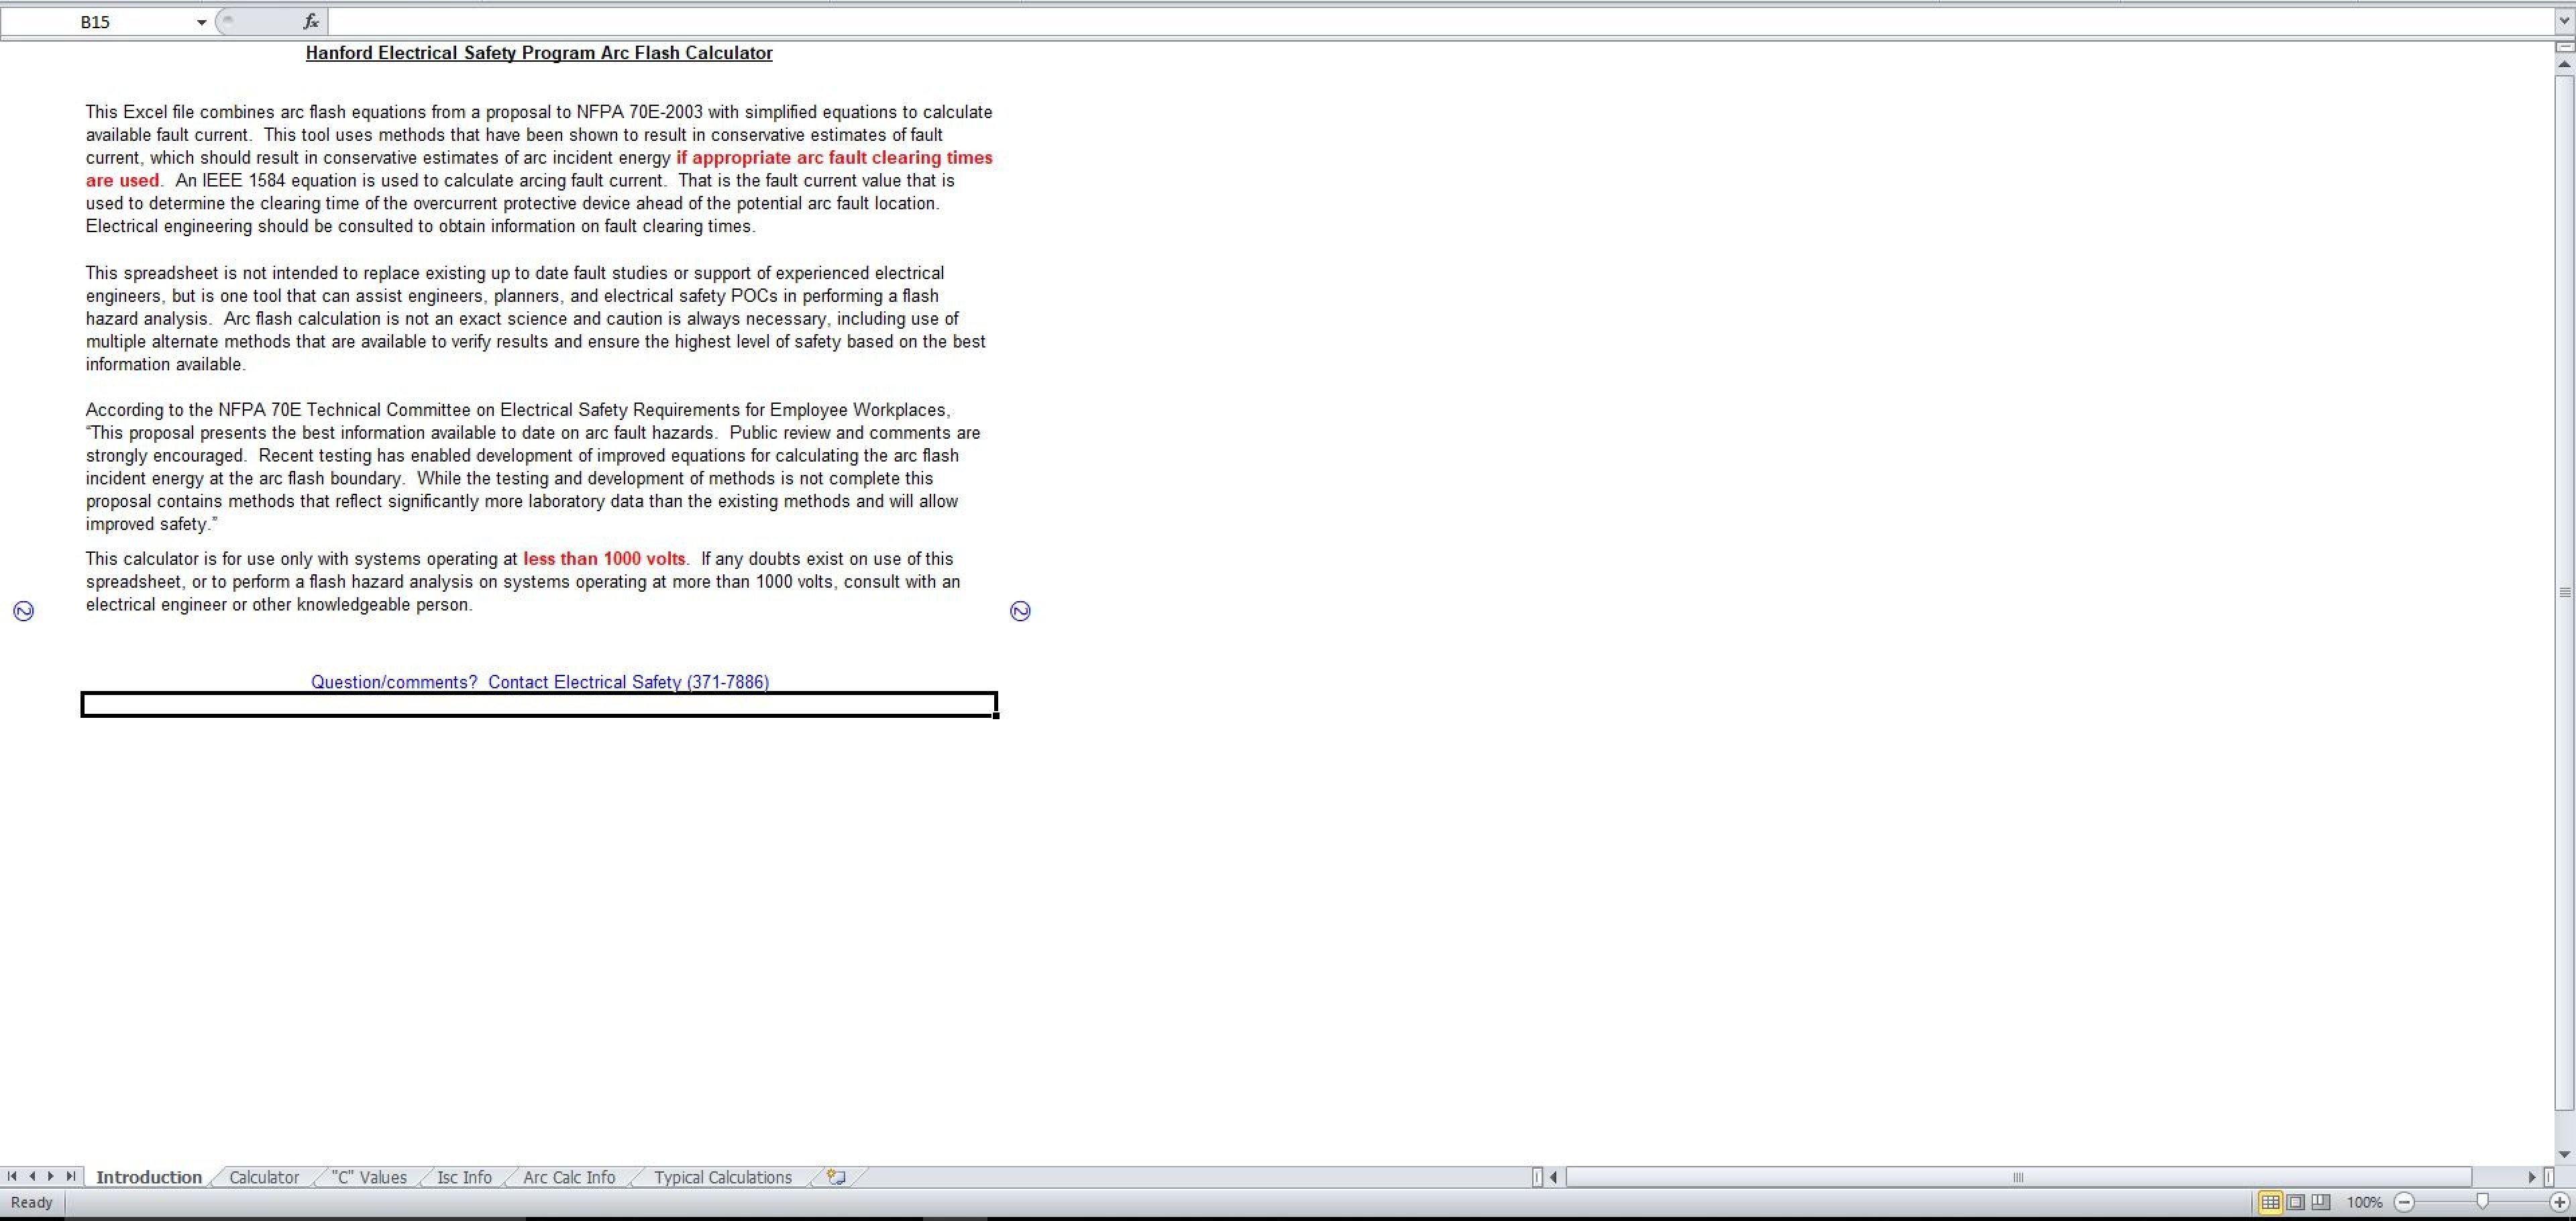 Ieee 1584 Spreadsheet Calculator Throughout Hanford Electrical Safety Program Arc Flash Calculator  Eloquens